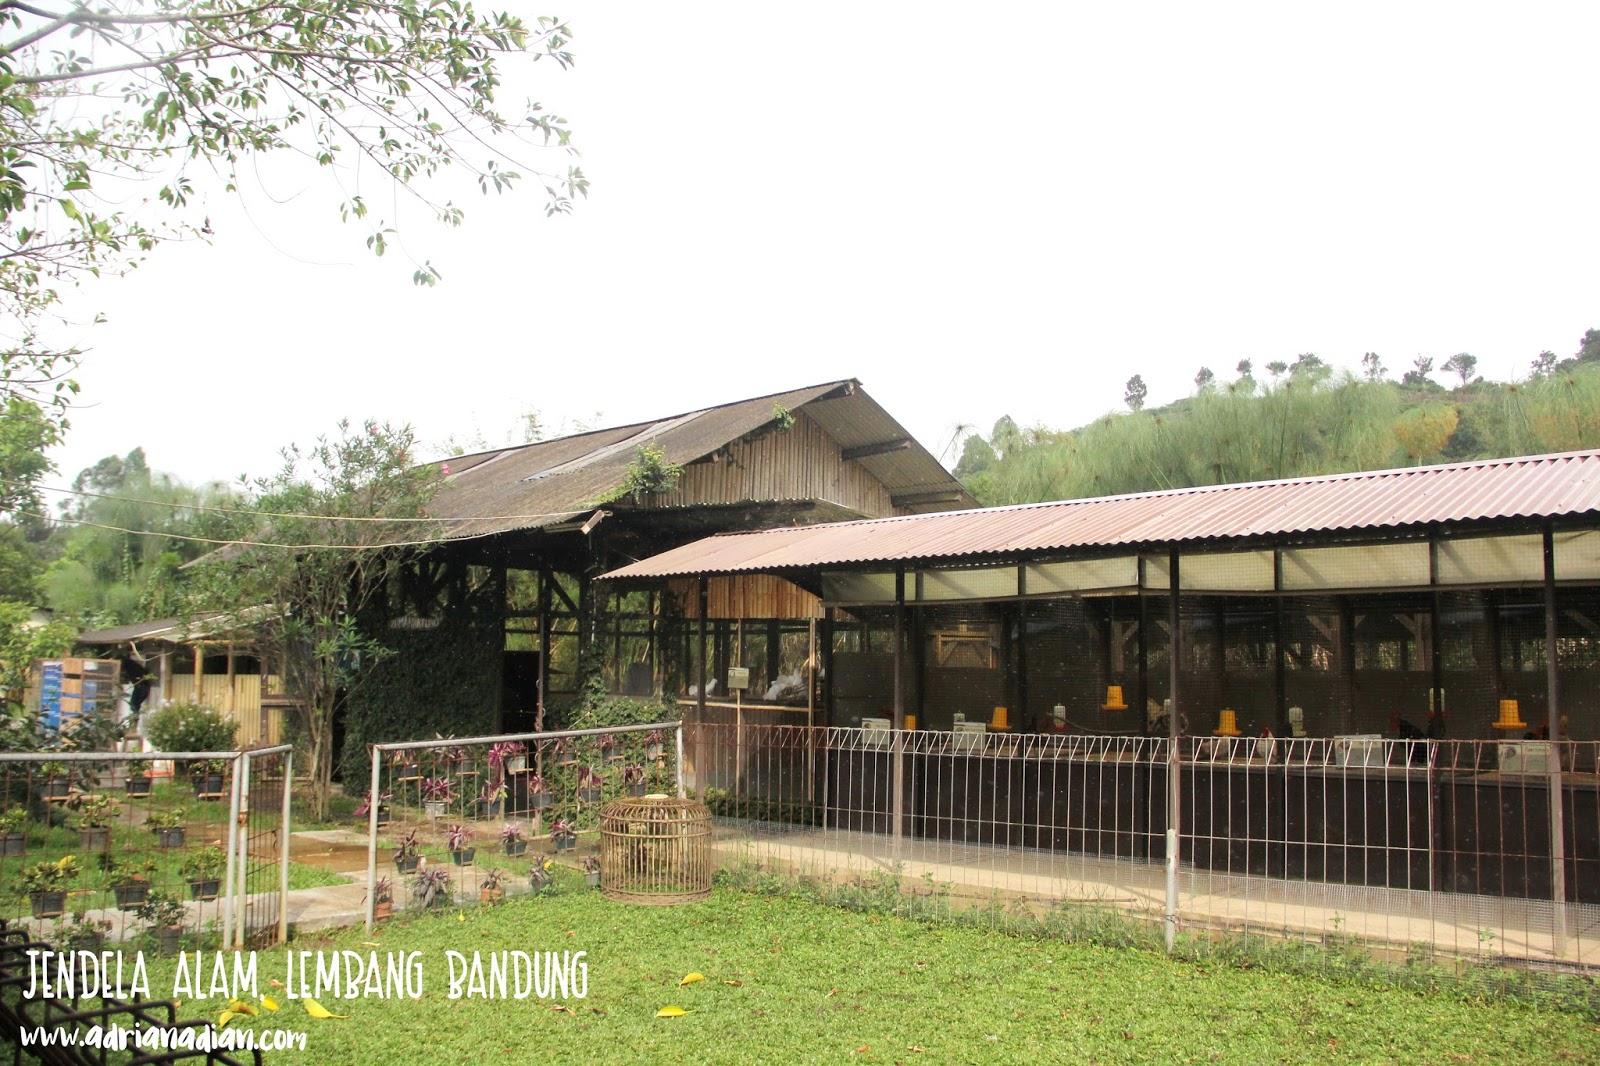 Jendela Alam Lembang Bandung